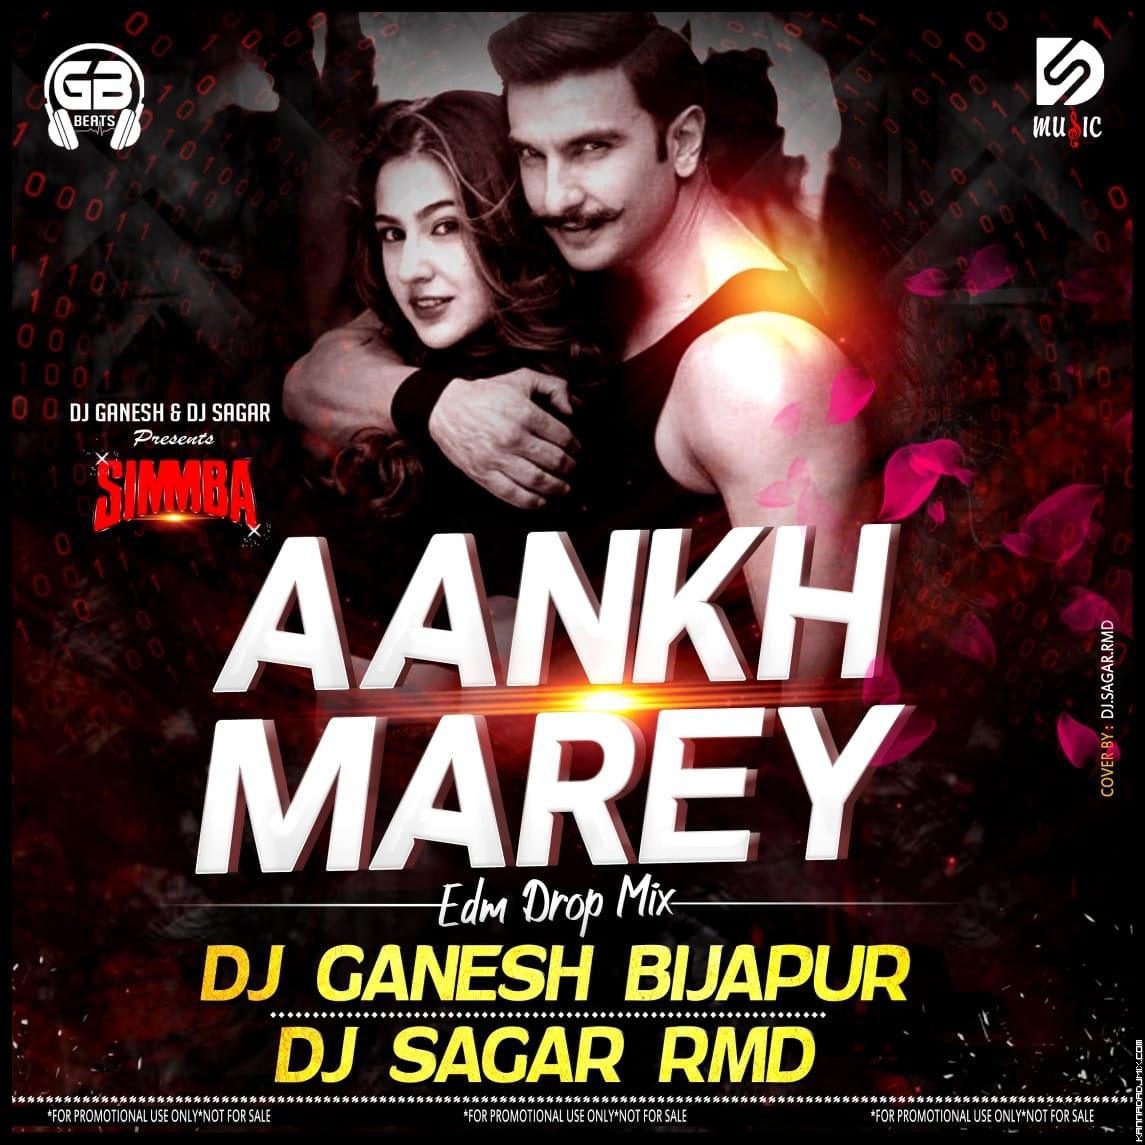 Aankh Marey_Simmba_ EDM MIX  DJ GANESH [BIJAPUR] AND DJ SAGAR RMD.mp3